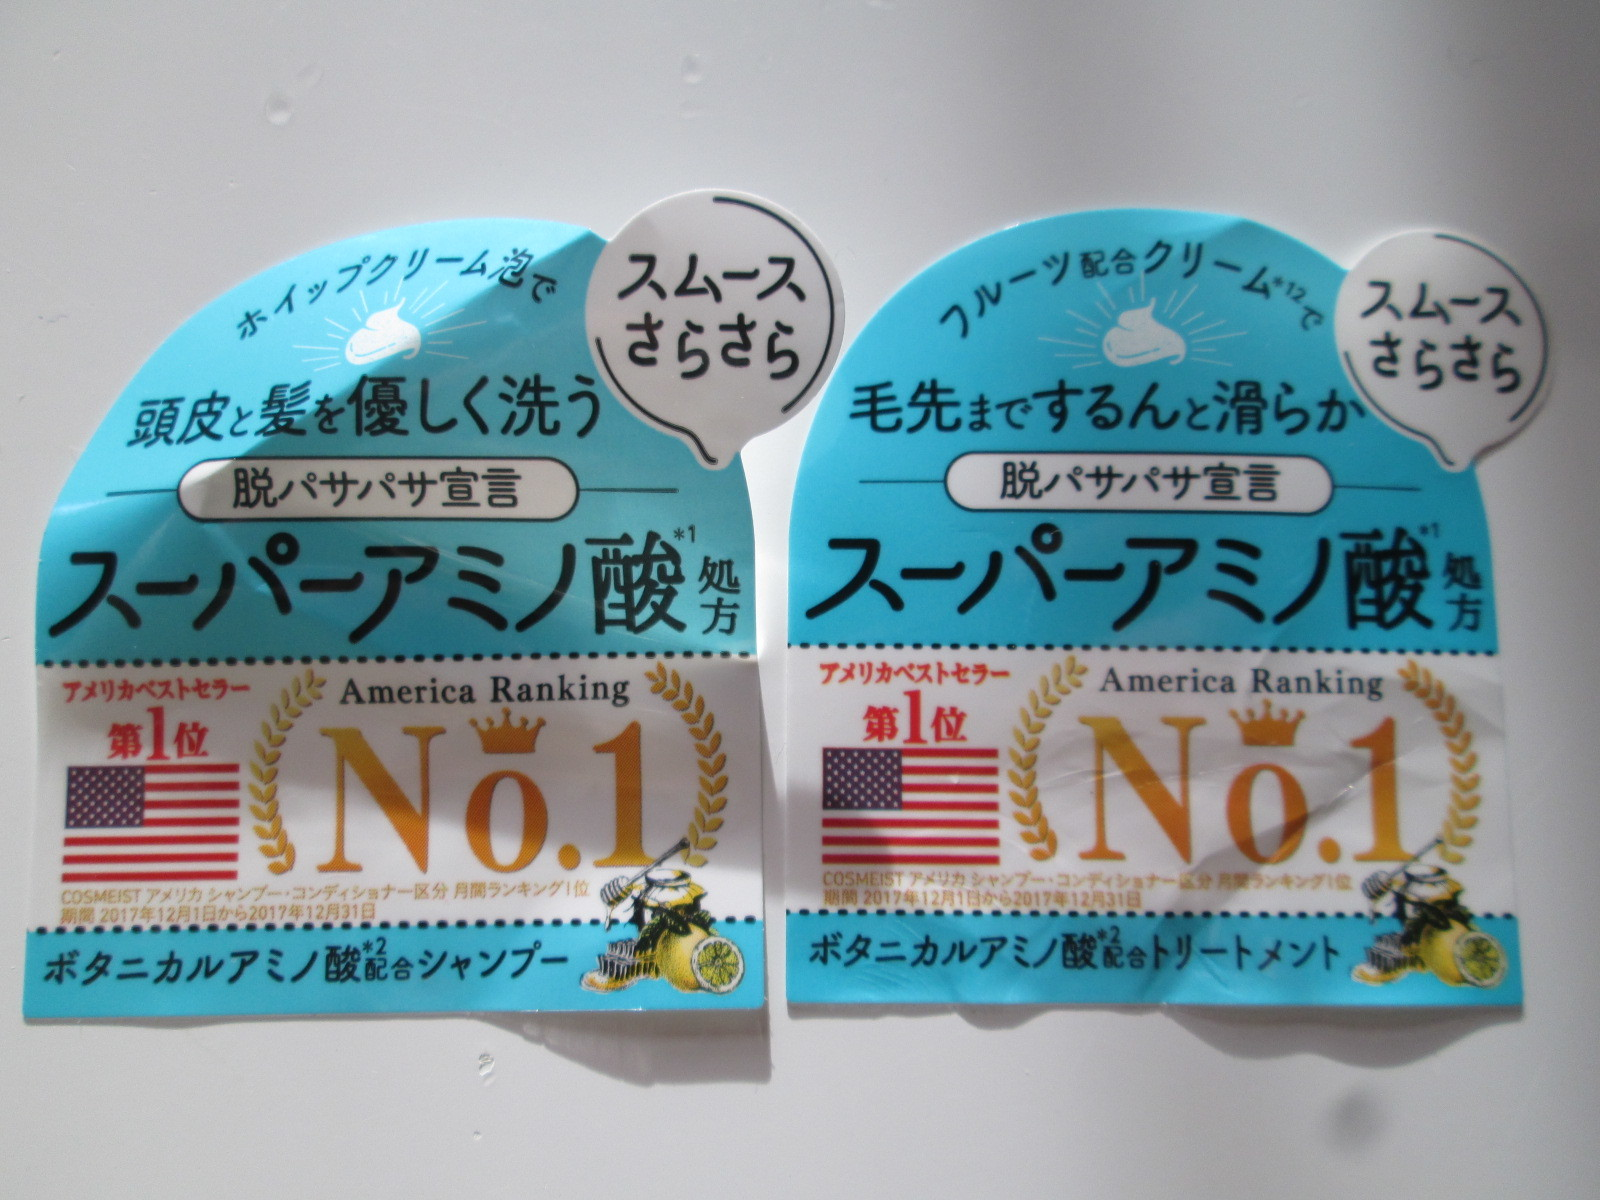 IMG_6510アミ (3)